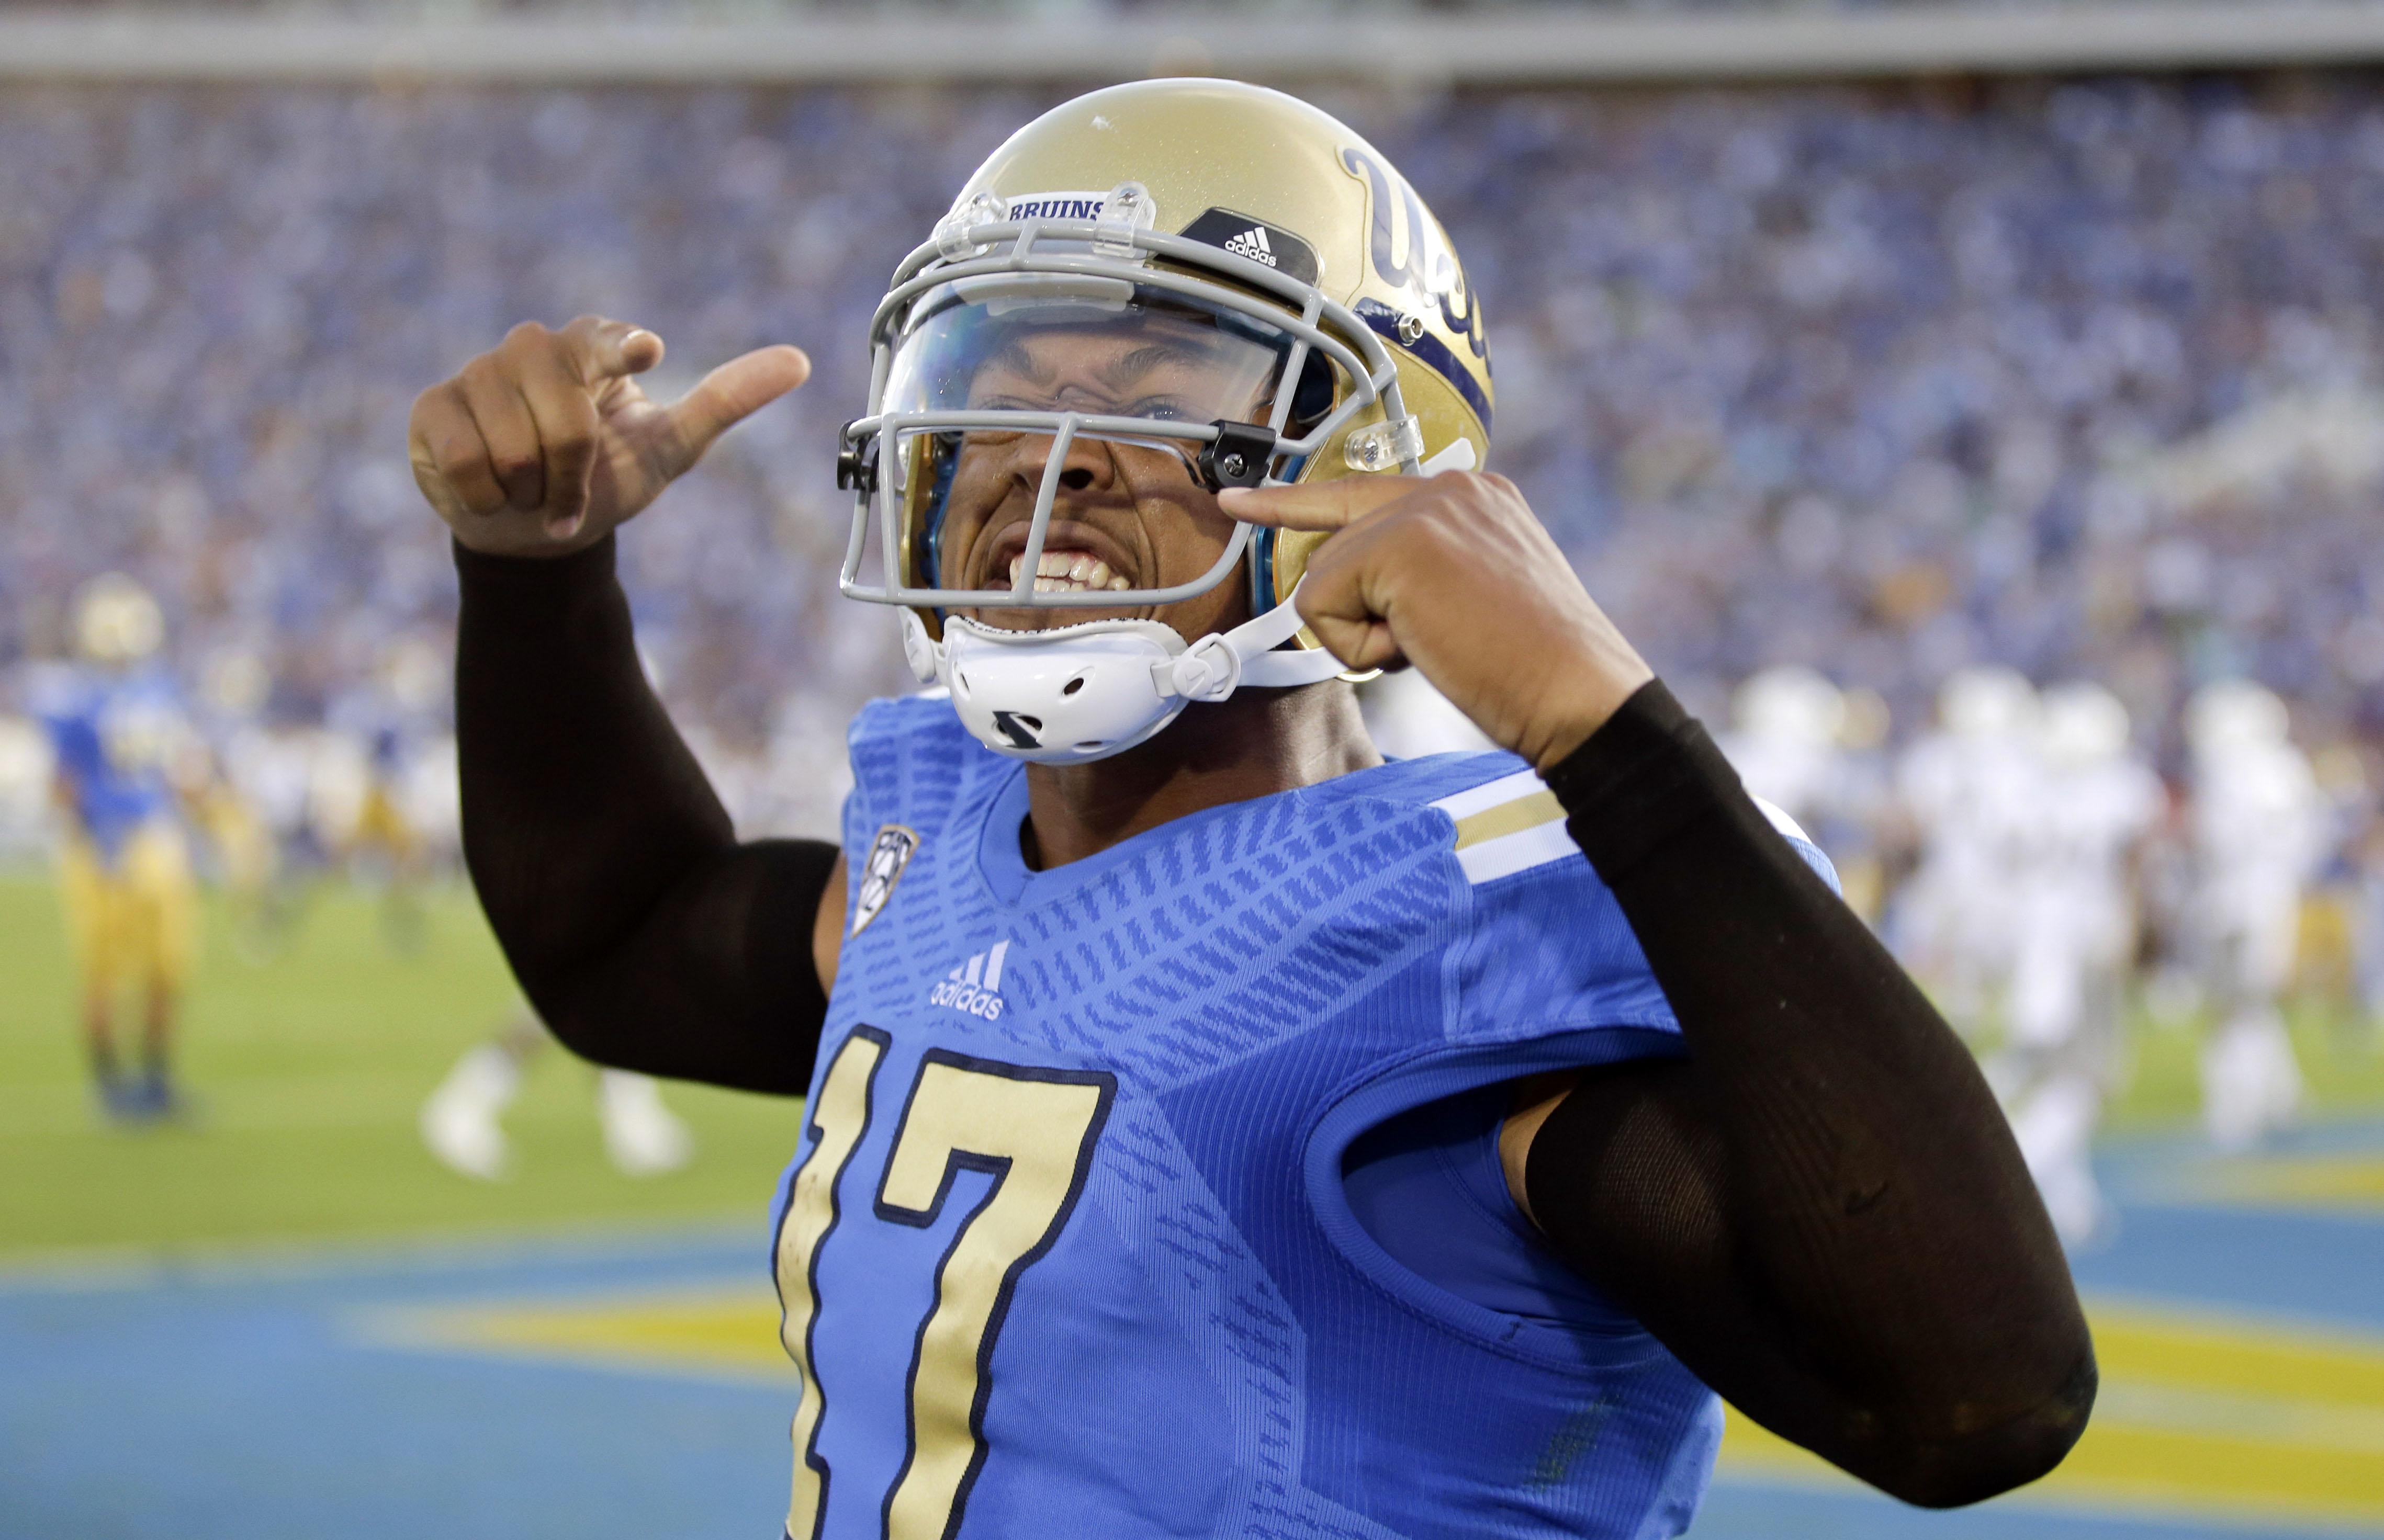 2015 NFL draft early entrants